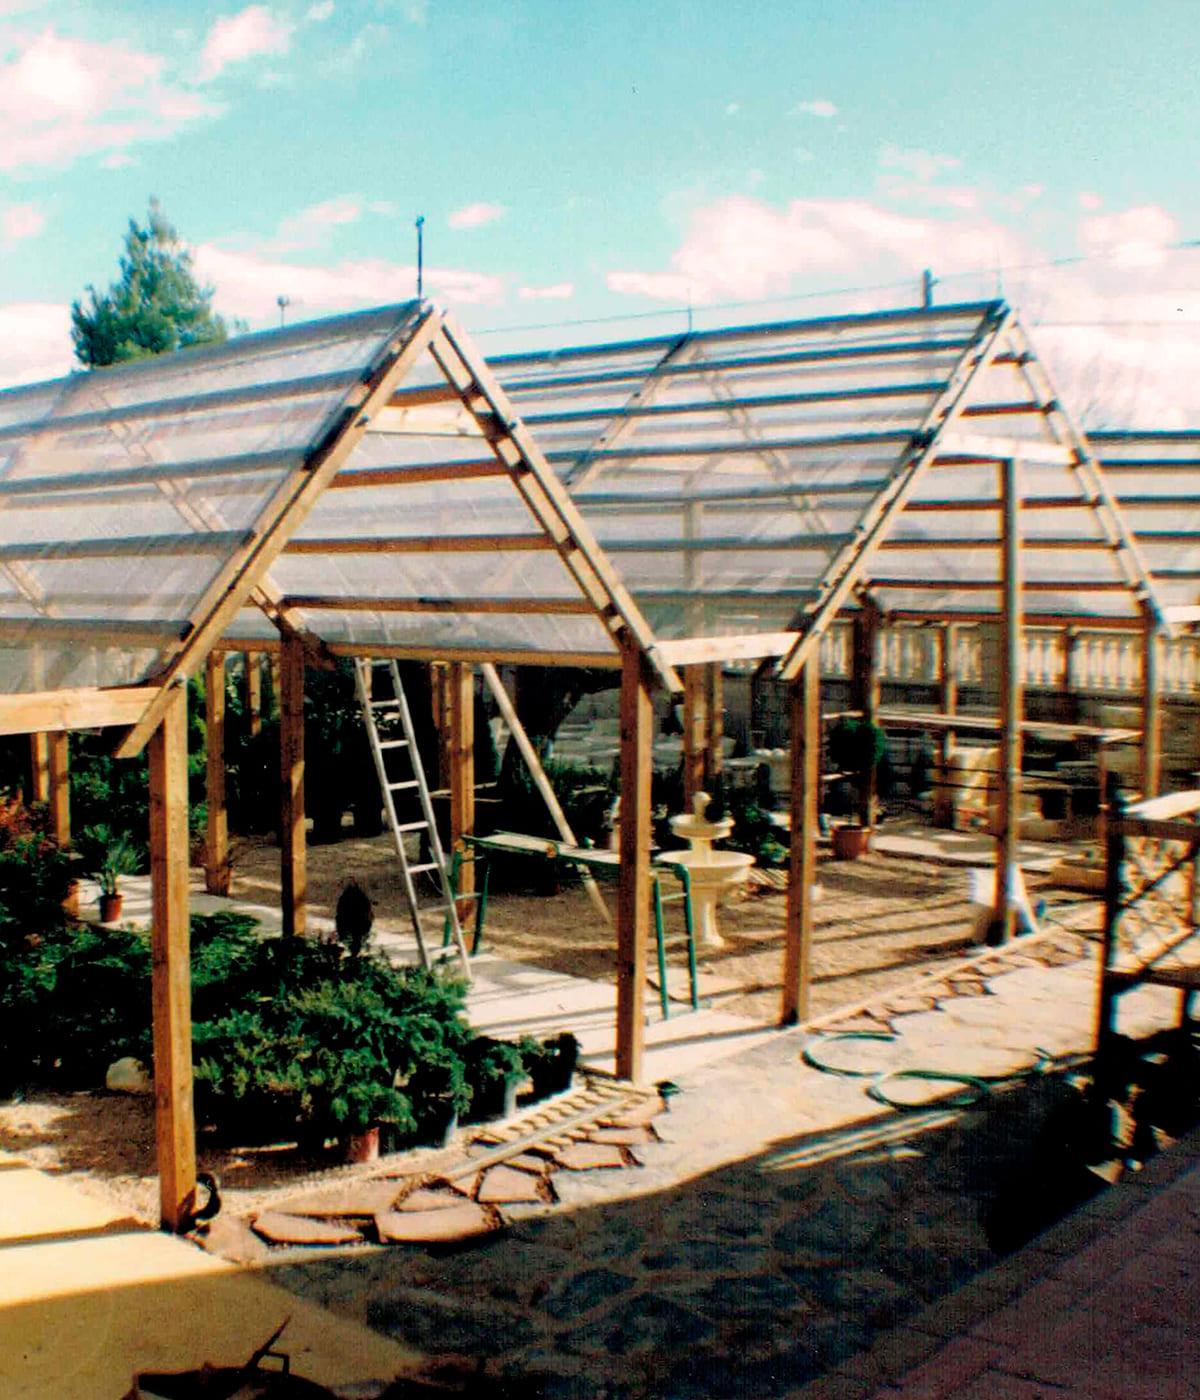 construccion-invernadero-madera-artesanal-02_HIDROJARDIN-Bañeres